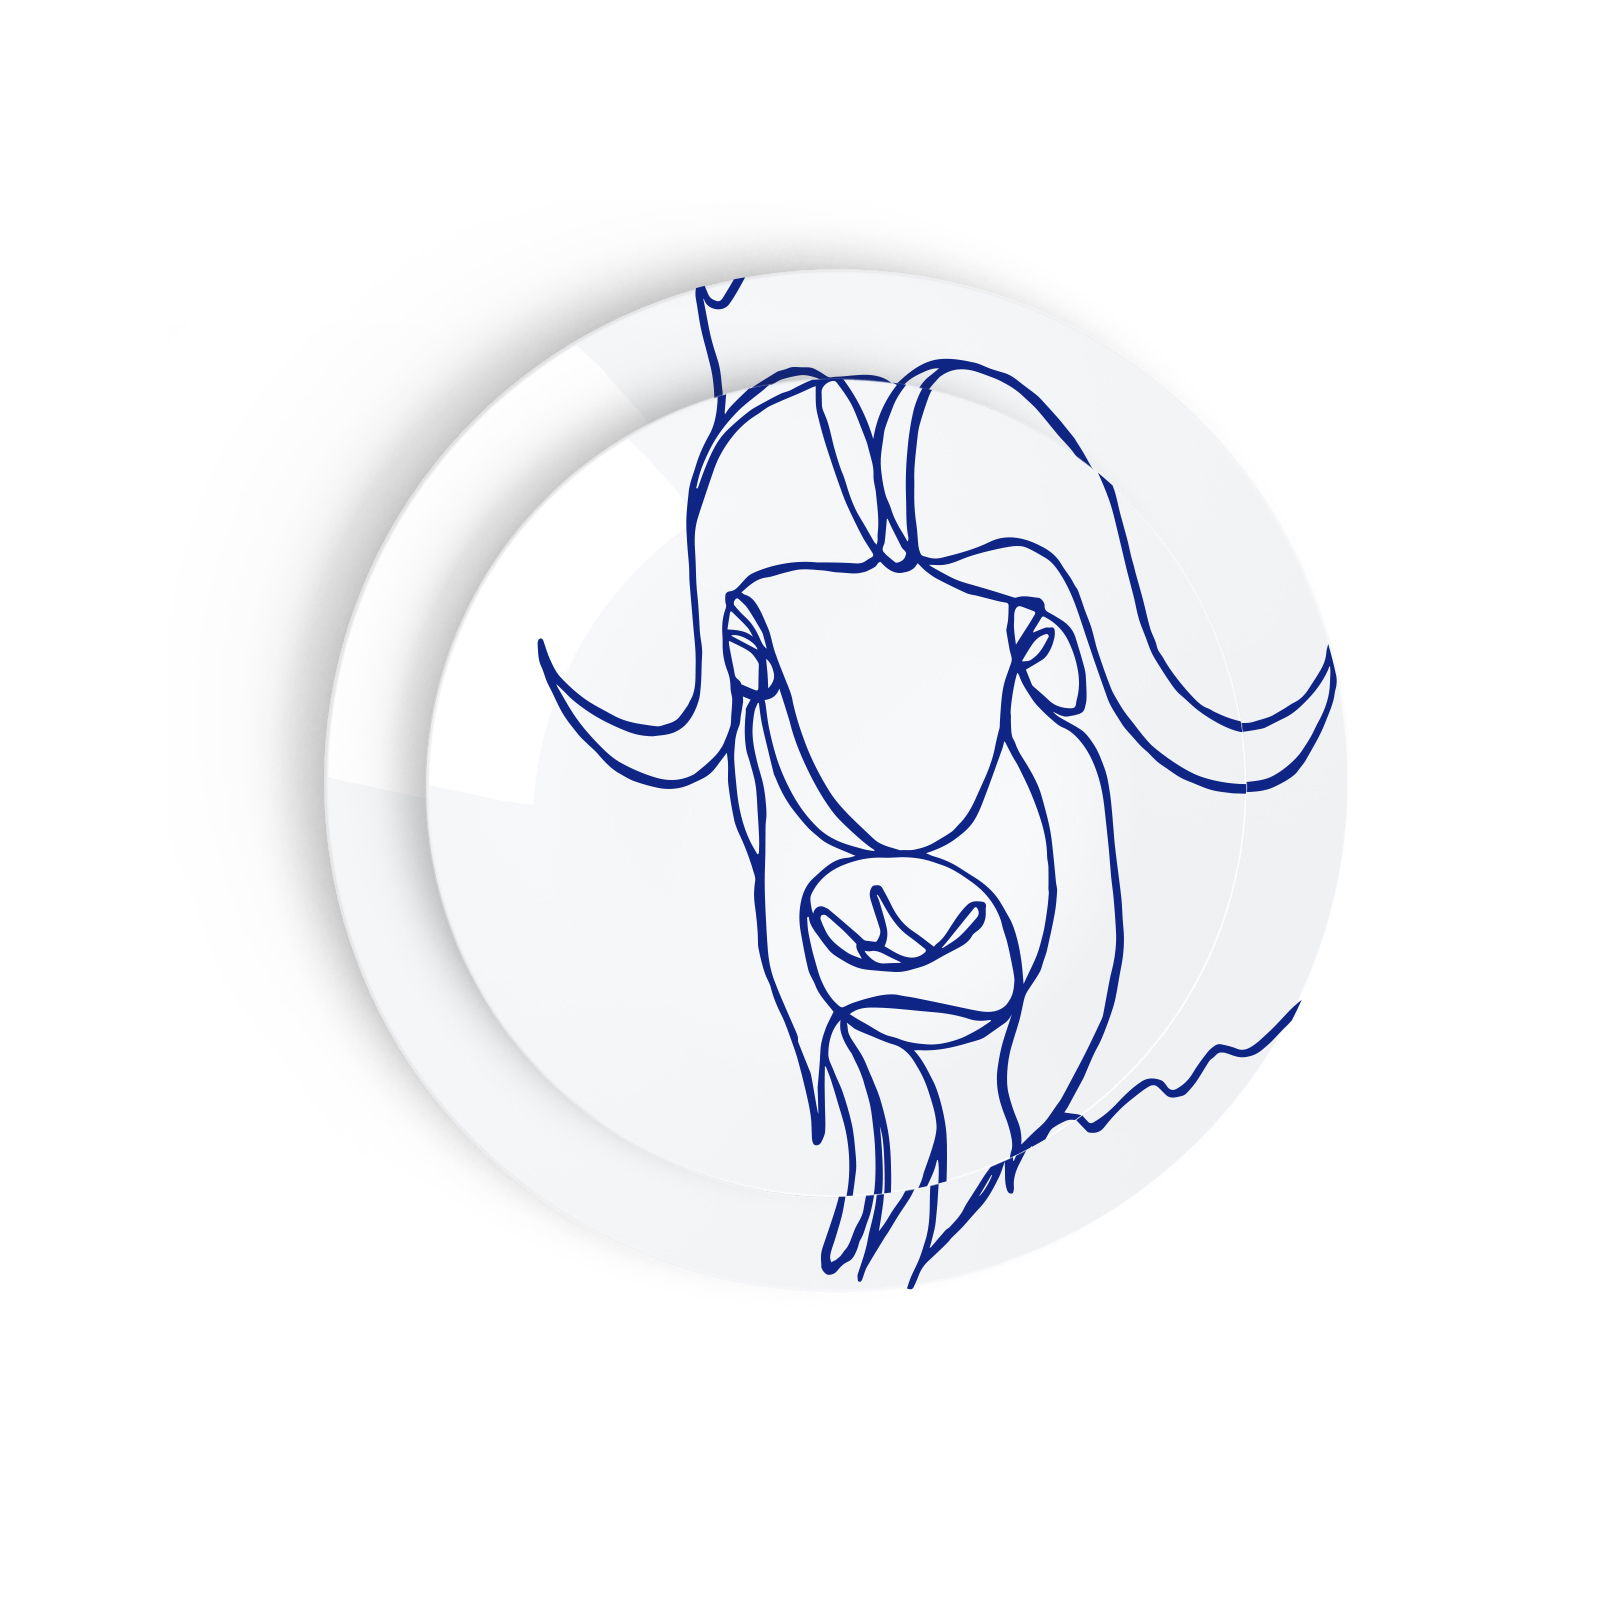 Tes Ted Artic Beasts Muskox - Esprit Porcelaine, Porcelaine De Limoges